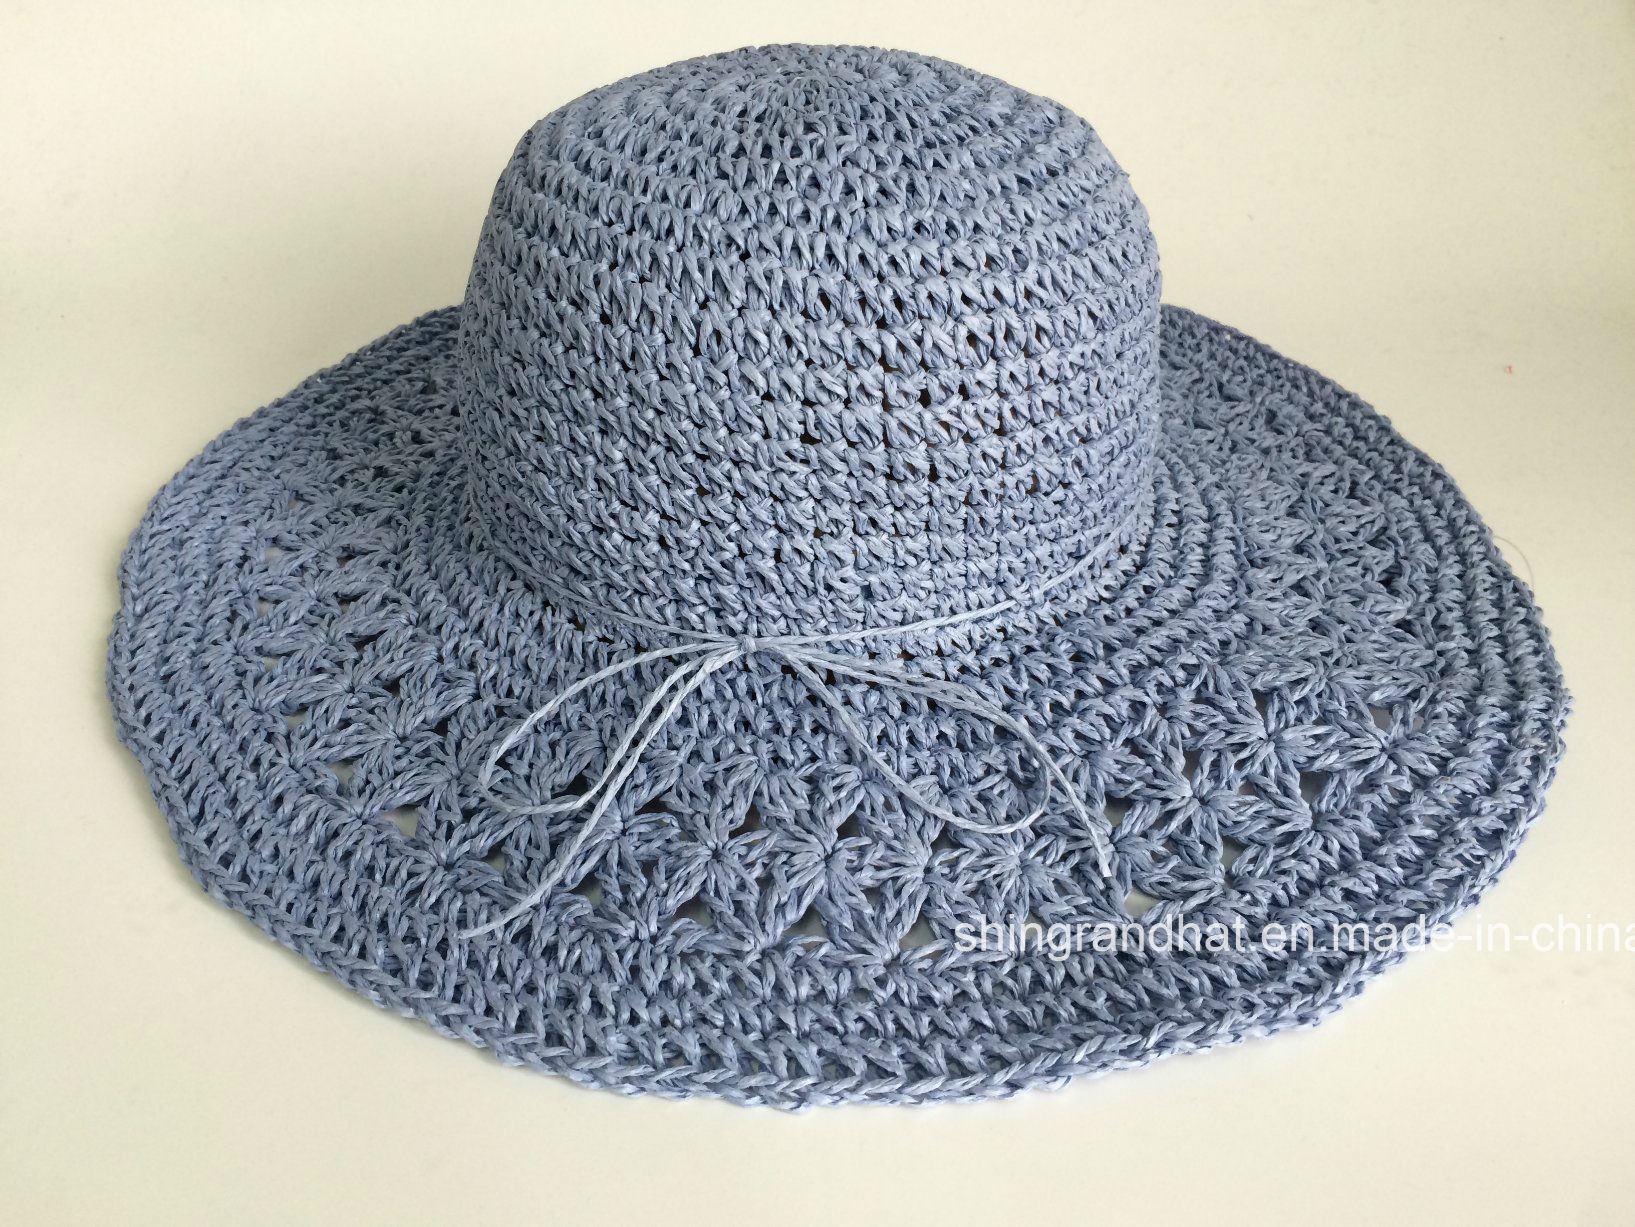 China Hand Crocheted Pattern Paper Straw Women Hat - China Straw Hat ...